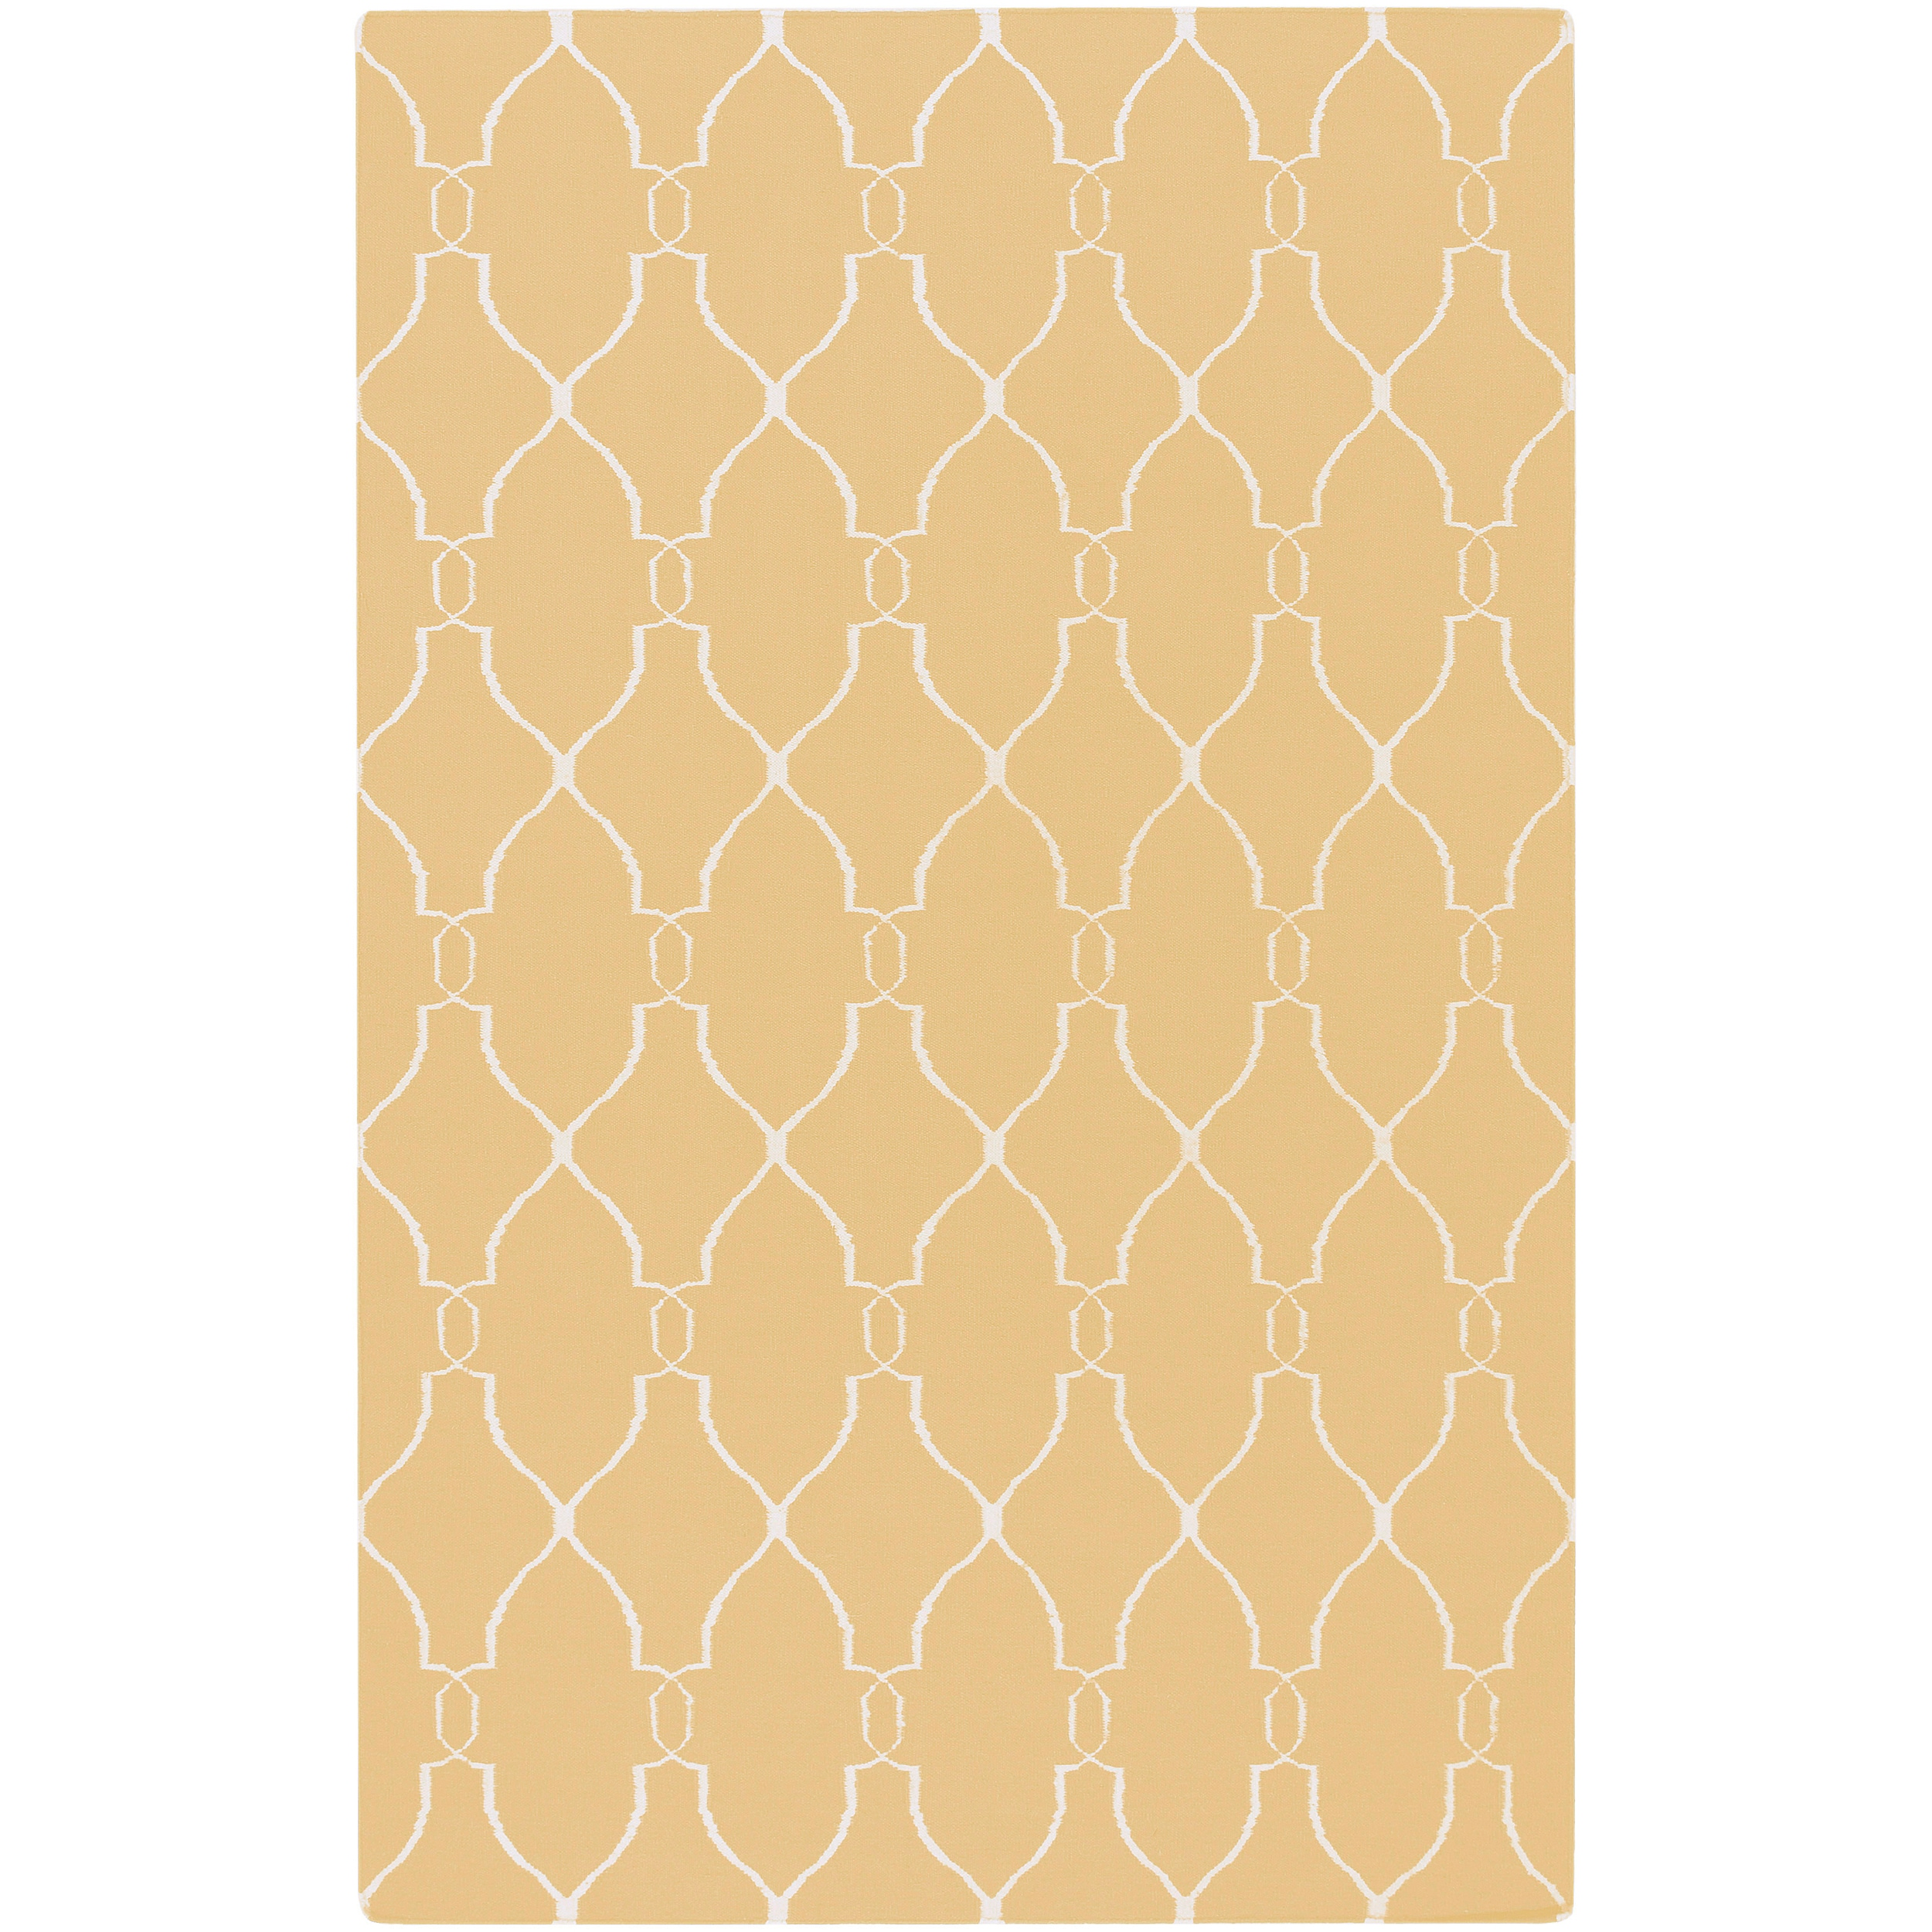 Hand-woven Min Sunflower Yellow Flatweave Wool Rug (3'6 x 5'6)